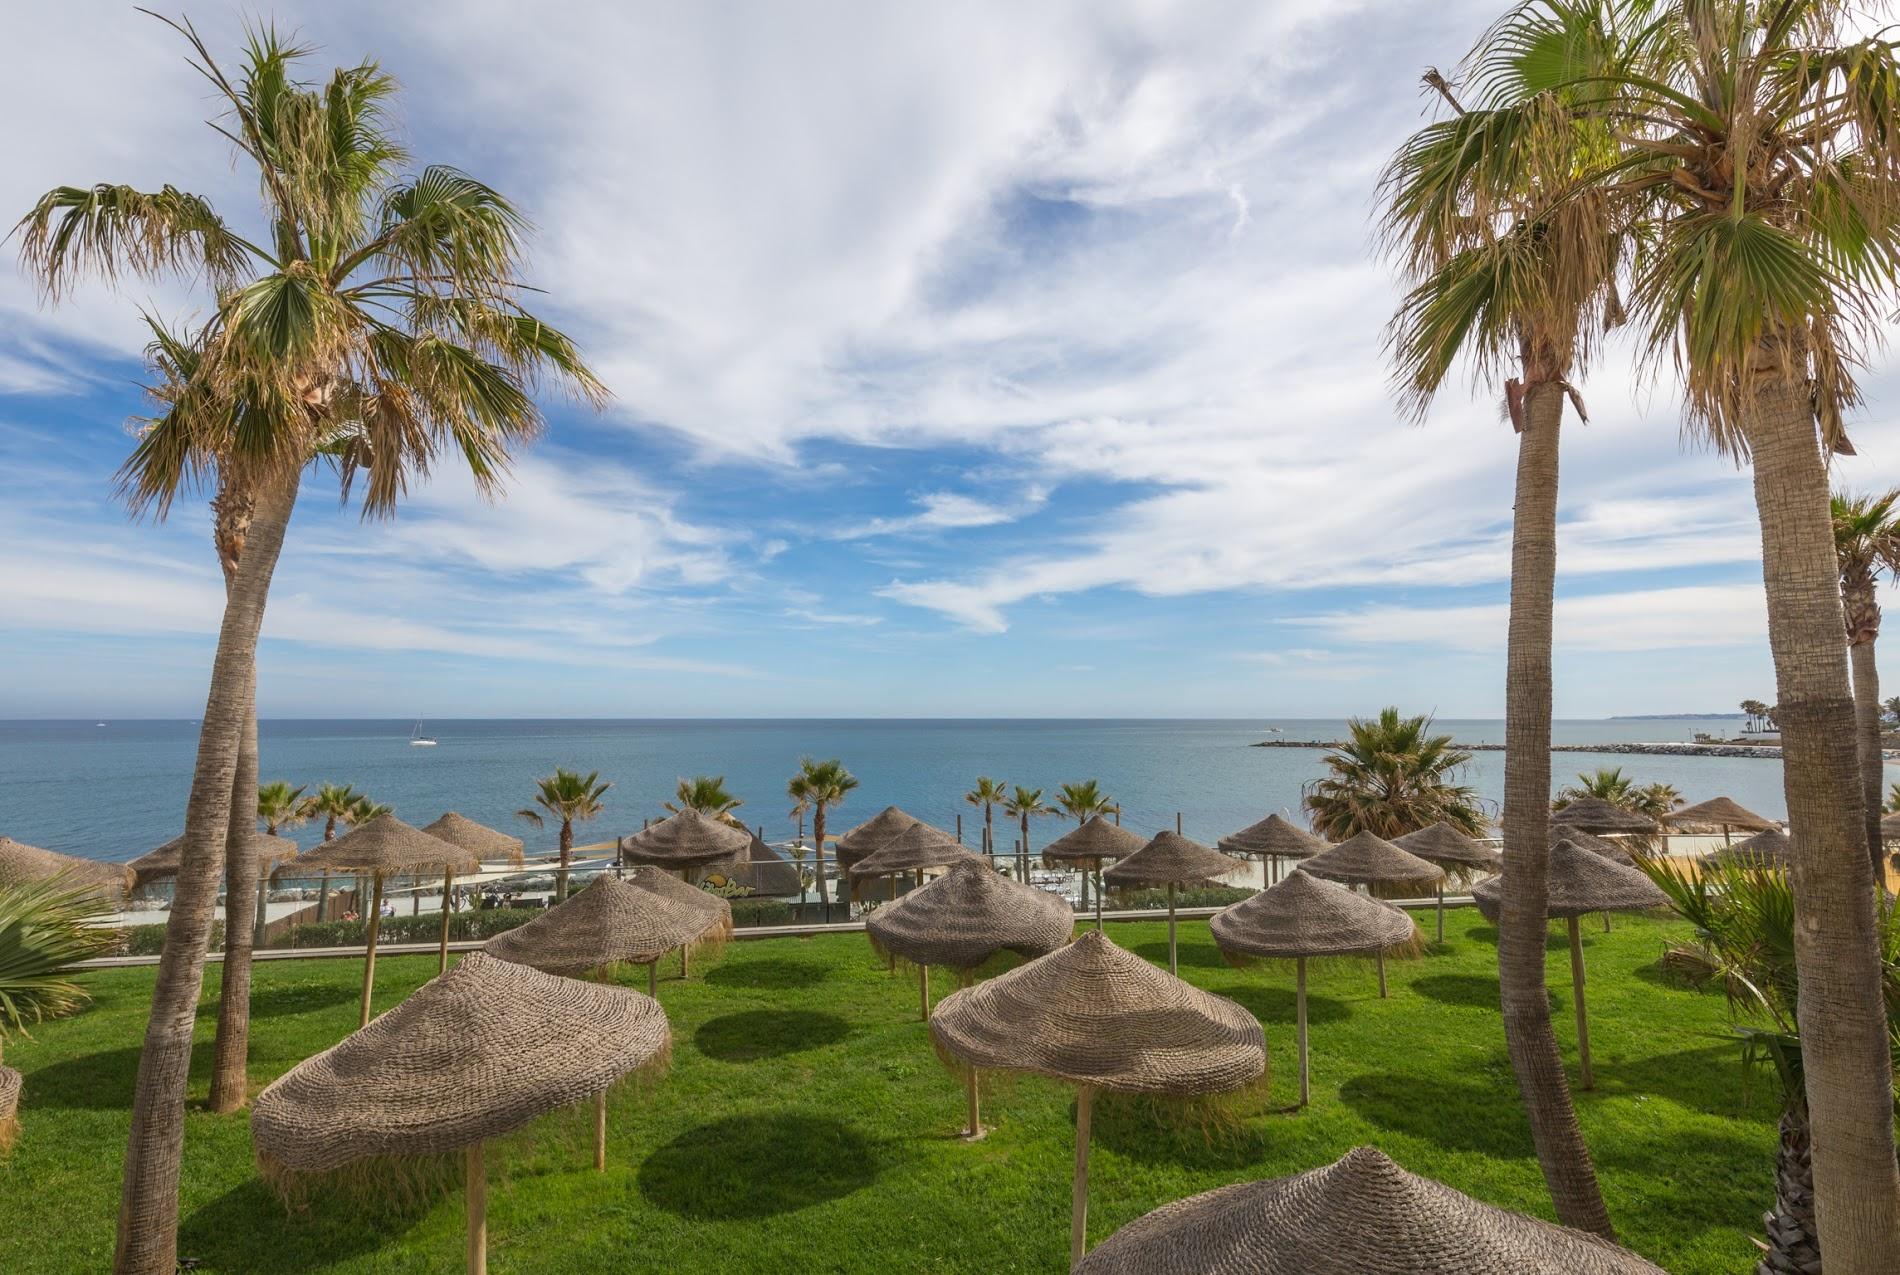 All Inclusive Sun Holidays to Best Hotel Benalmadena